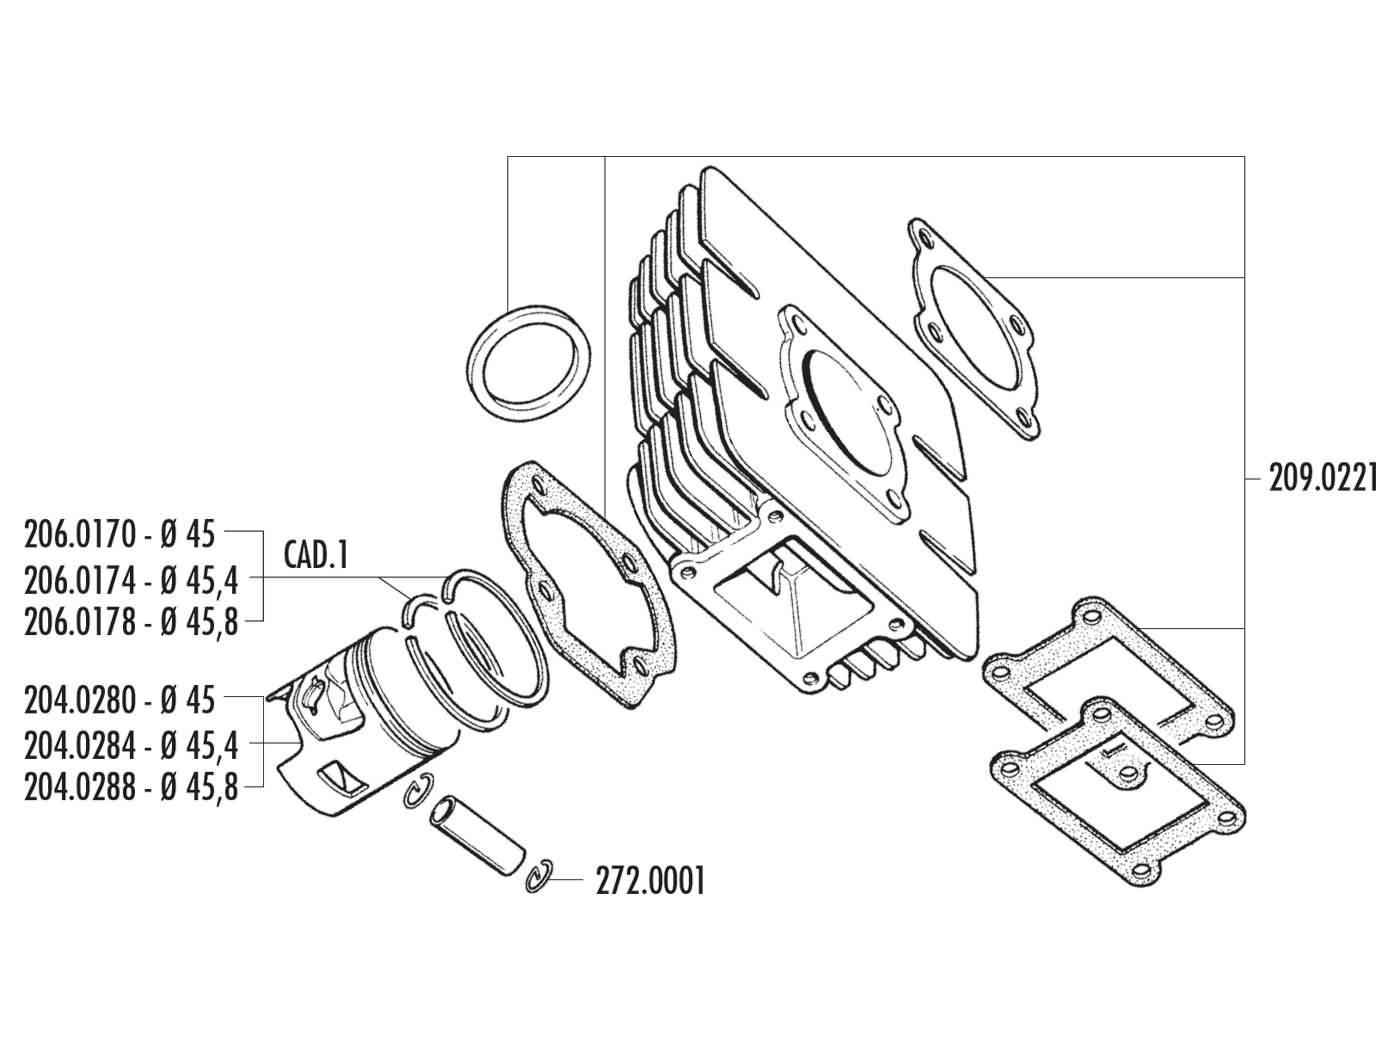 Cylinder Kit Polini Cast Iron Sport 63cc 45mm For Yamaha Dt Ac Hand Sealer Sj0052 Back 50 R M Mx 92